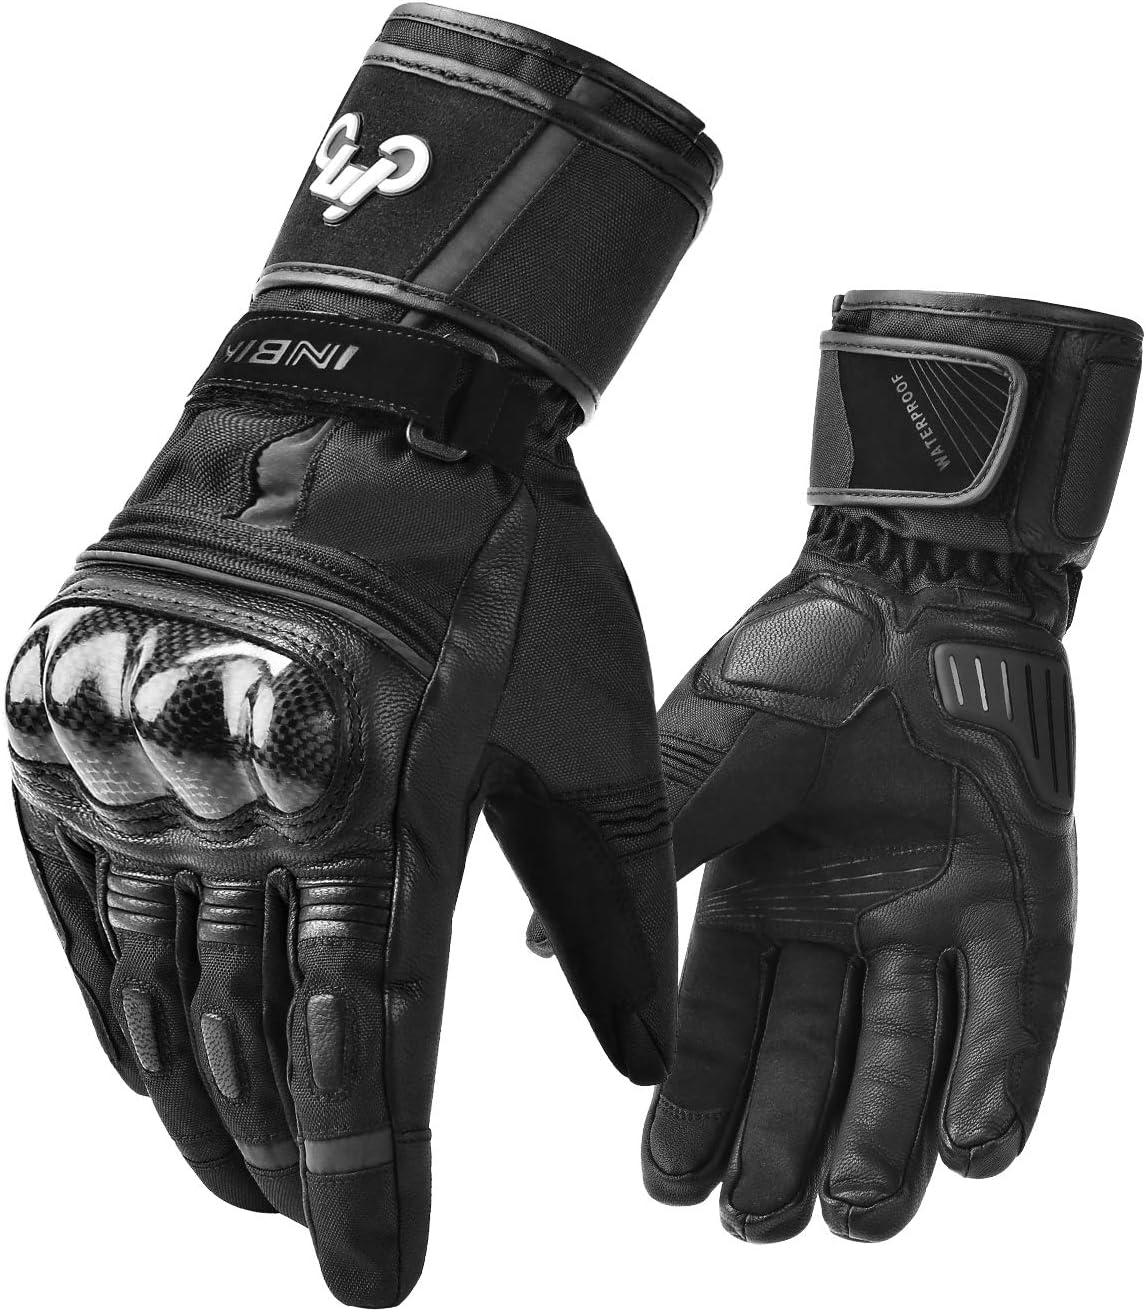 INBIKE Winter Goat Skin Leather Motorcycle Gloves,Waterproof Windproof Cold Weather Thermal Black Medium